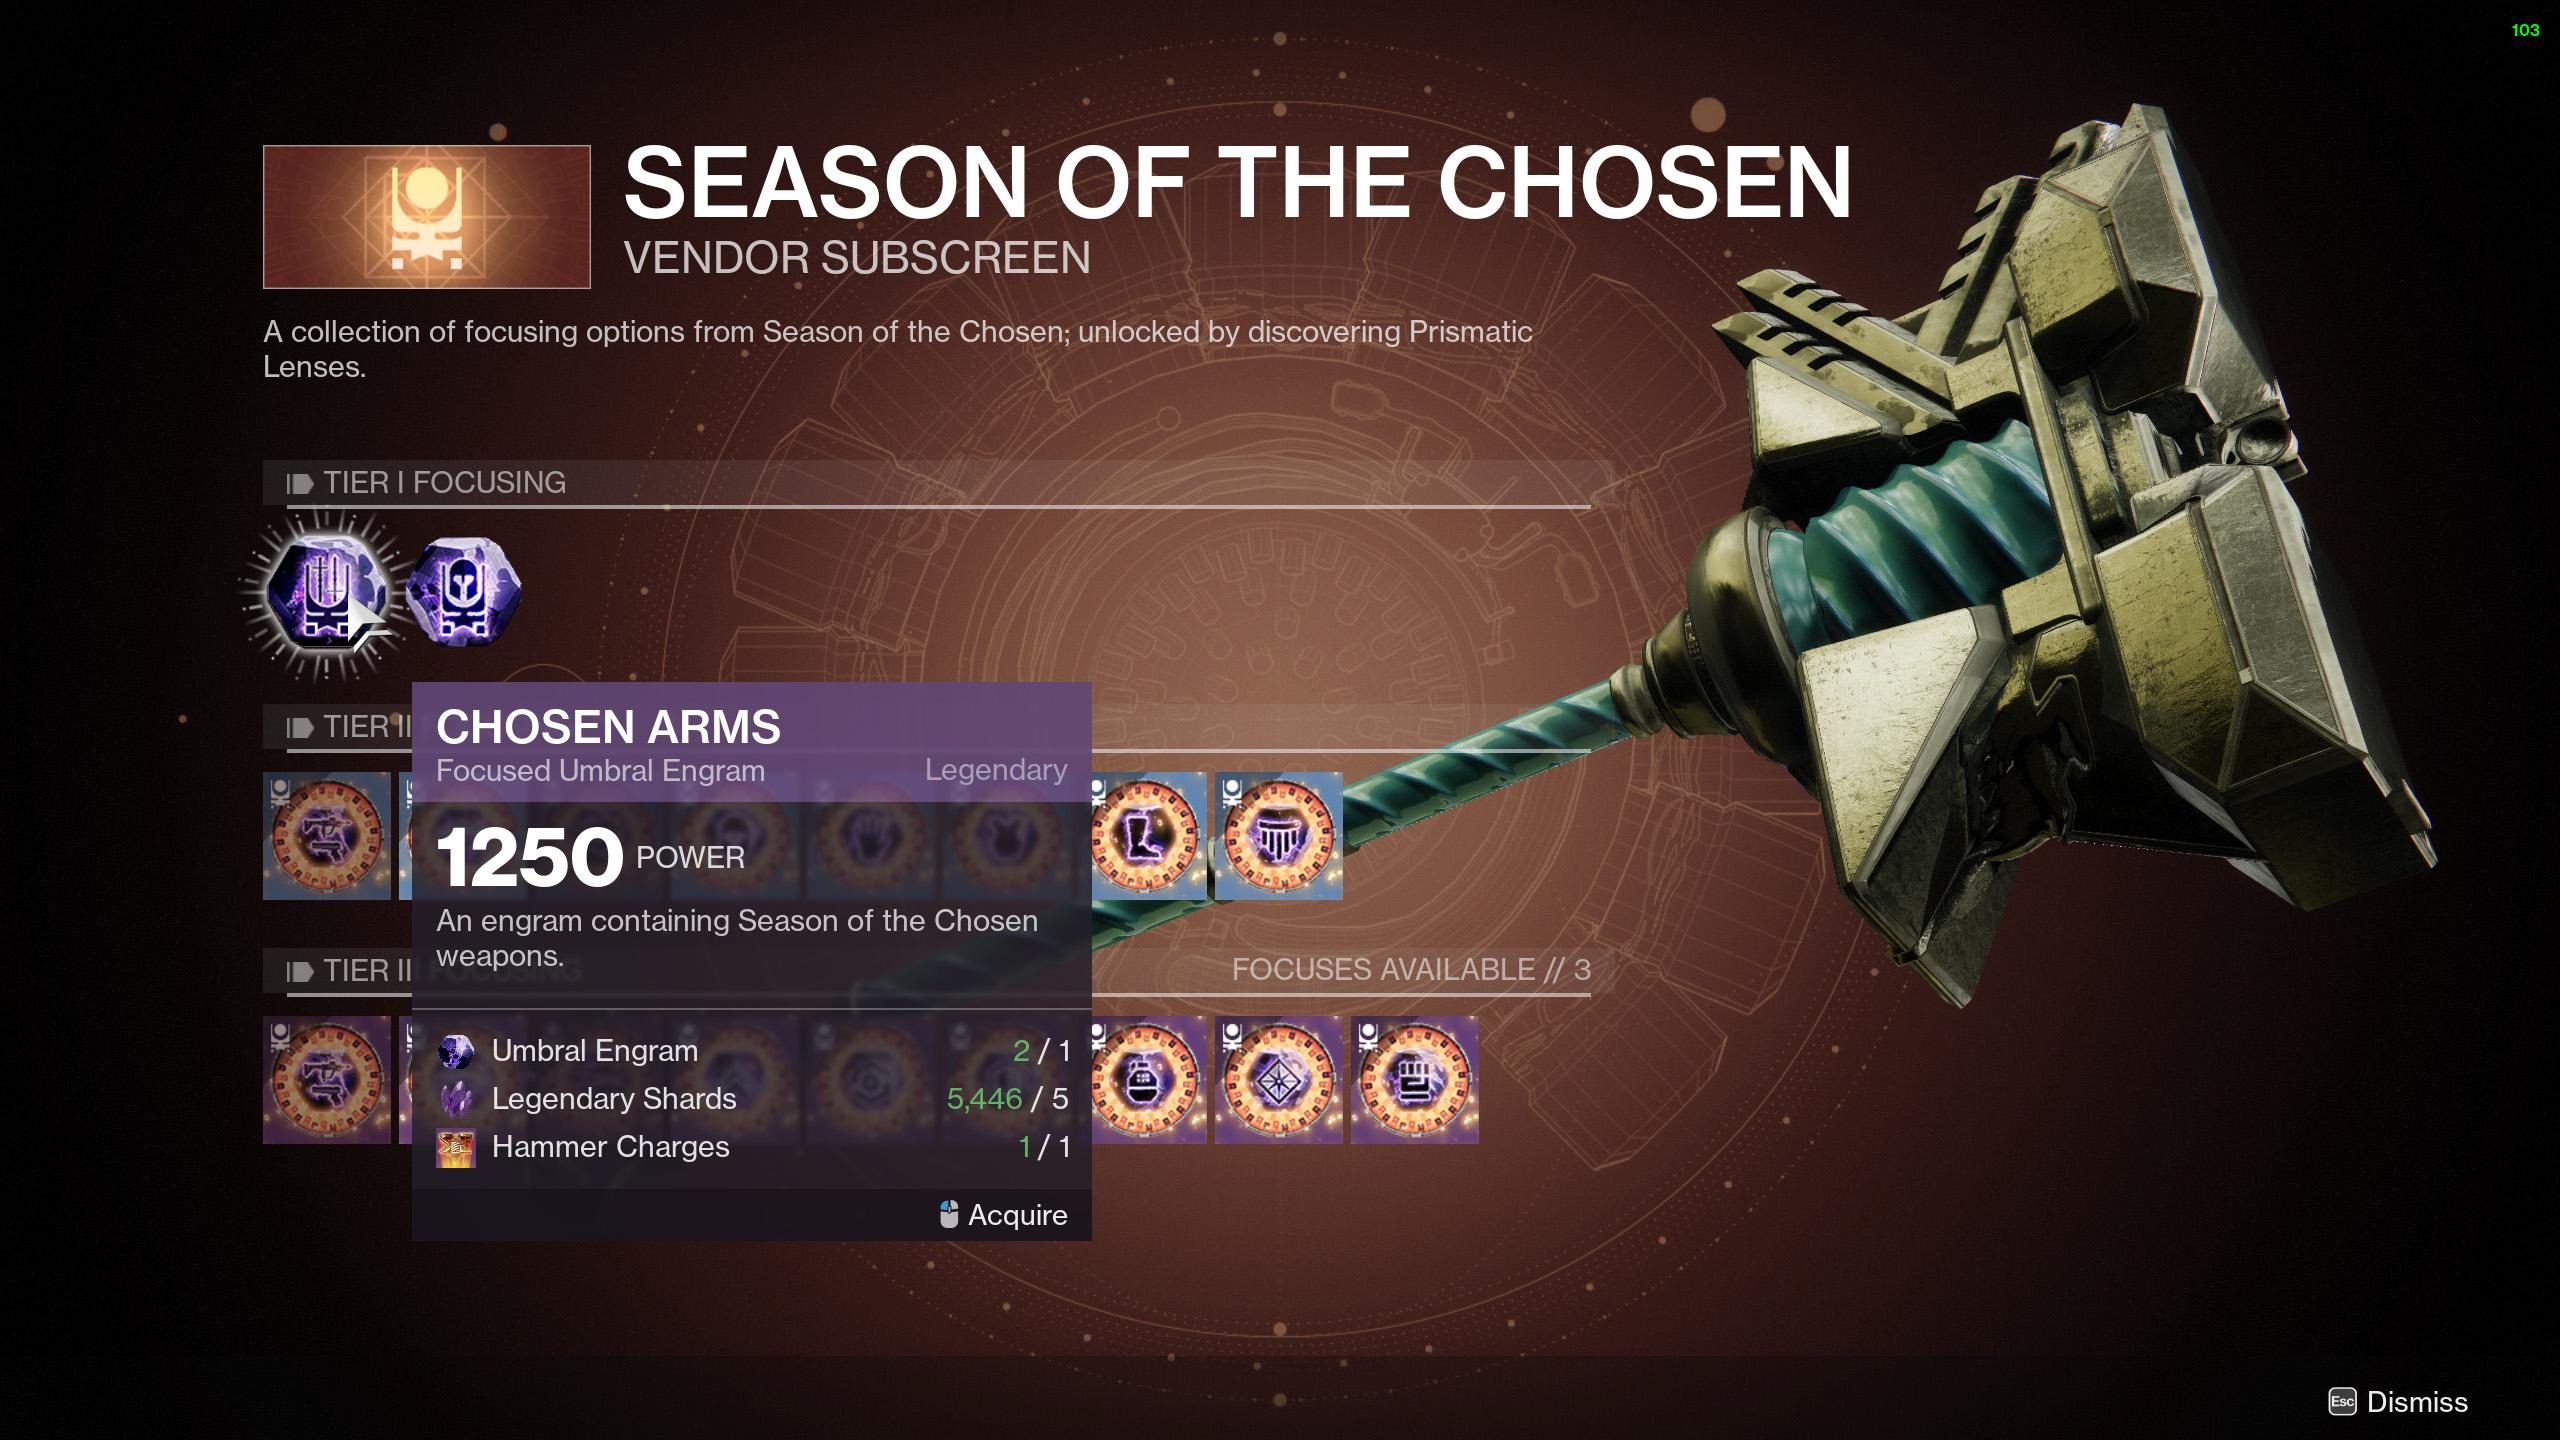 destiny 2 season of the chosen umbral engram